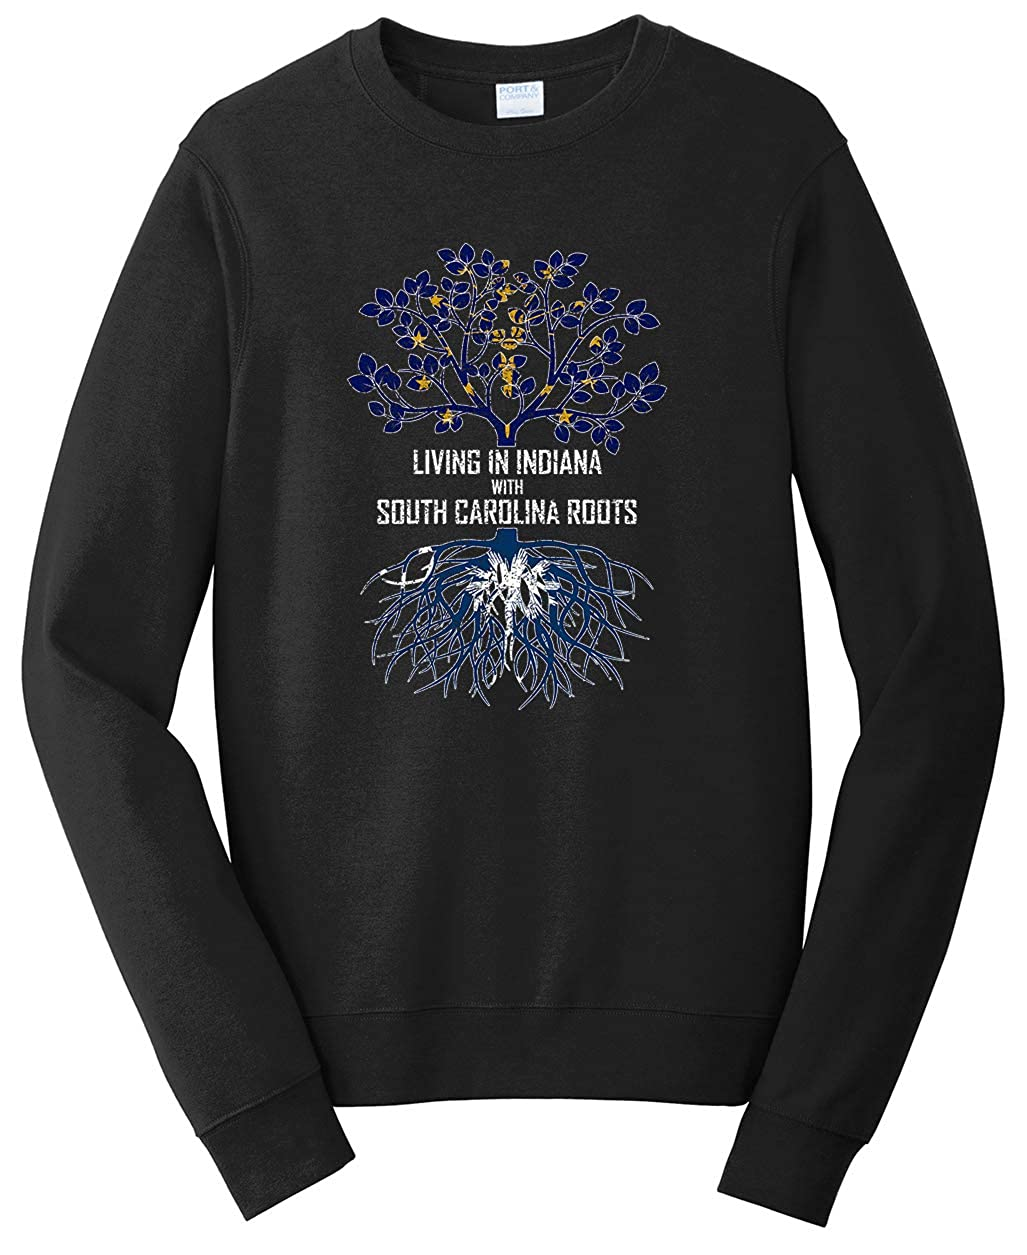 Tenacitee Girls Living in South Carolina with Indiana Roots Hooded Sweatshirt